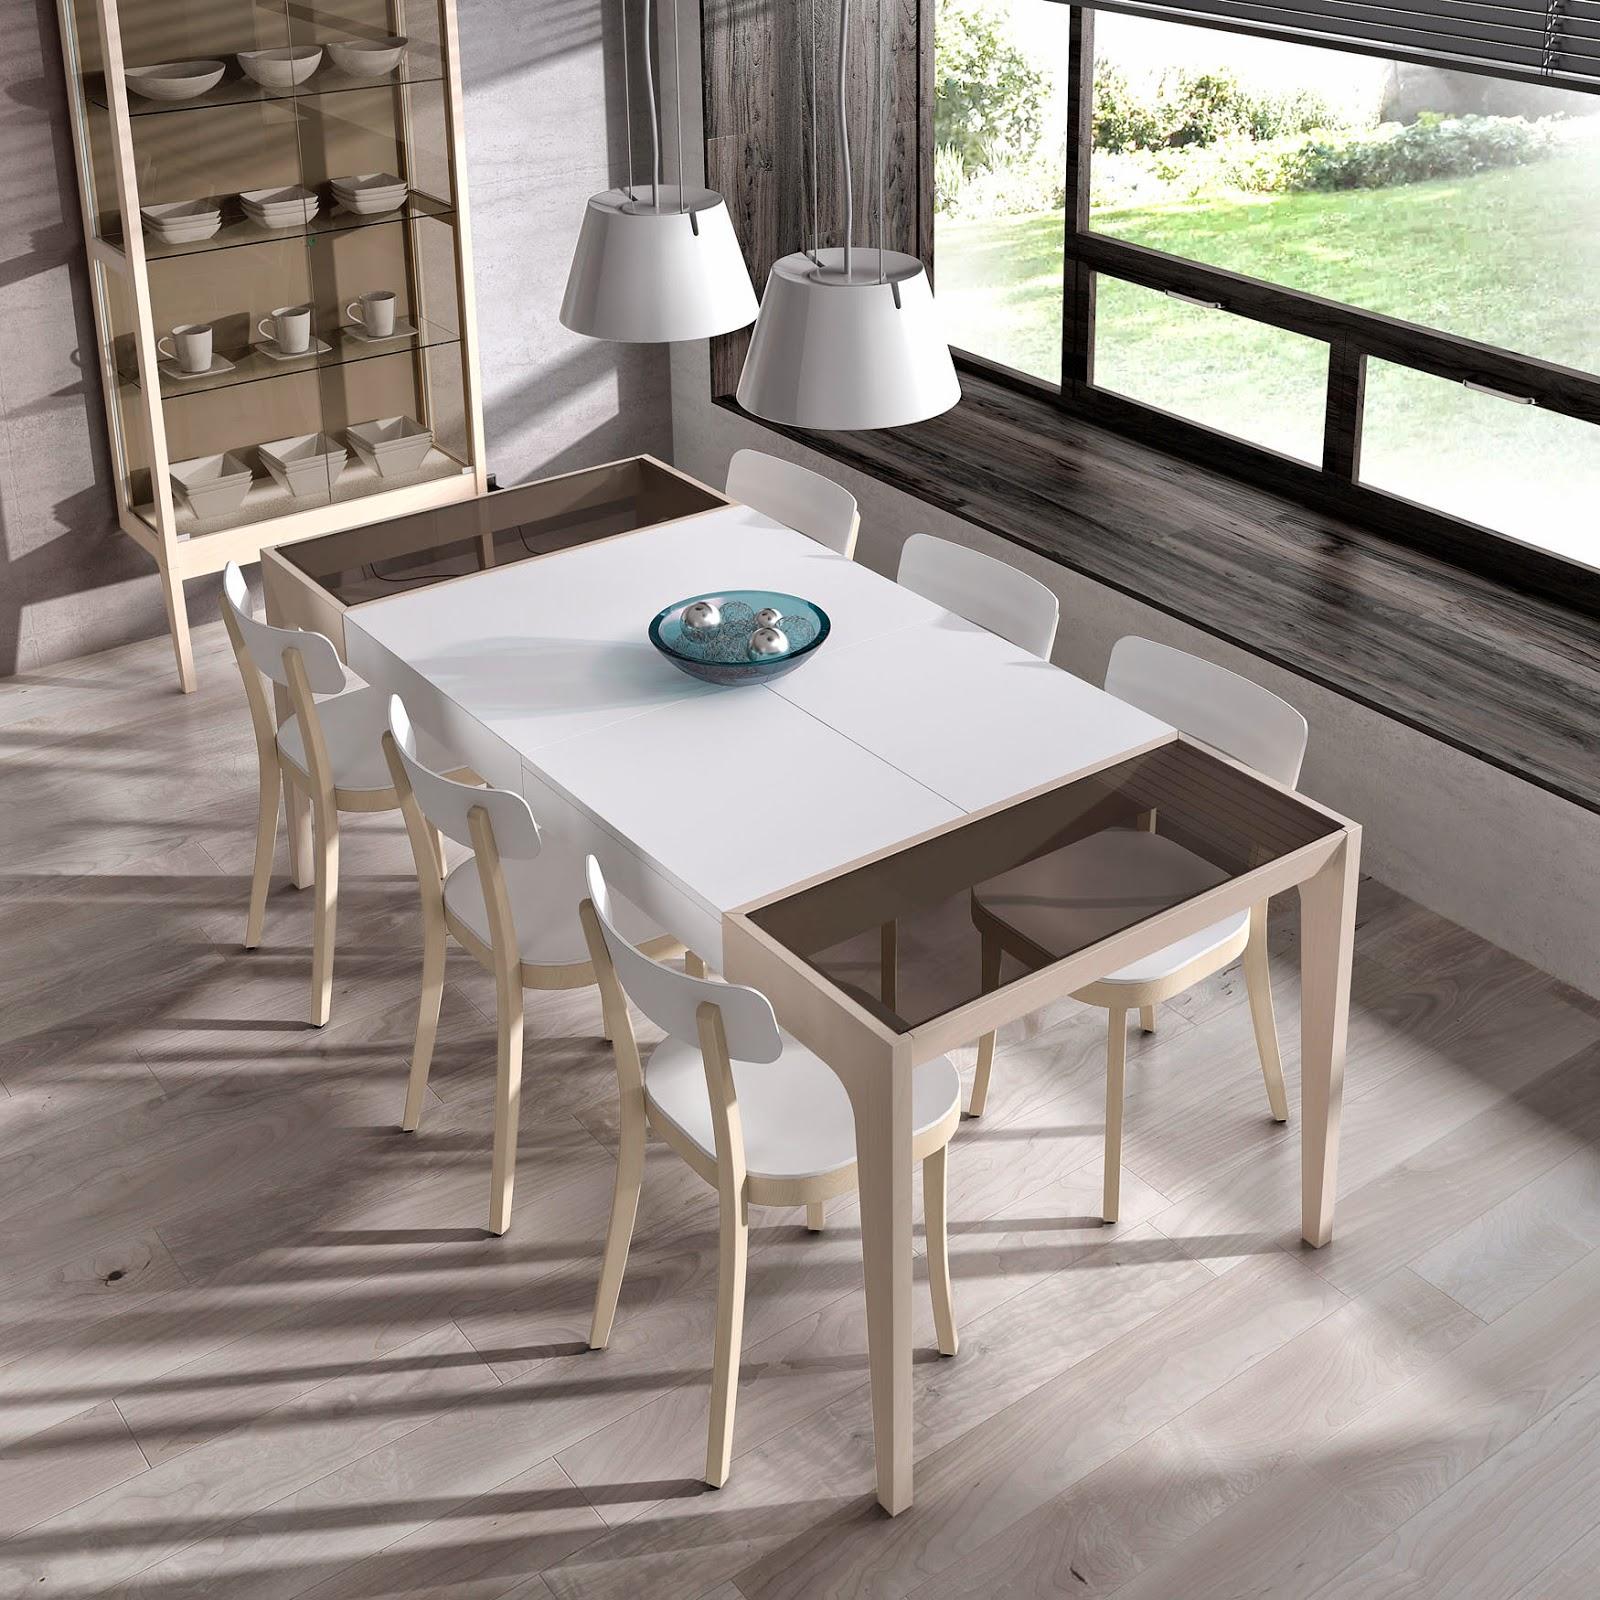 Arte h bitat tu tienda de muebles mesa de cristal exact for Piferrer muebles catalogo